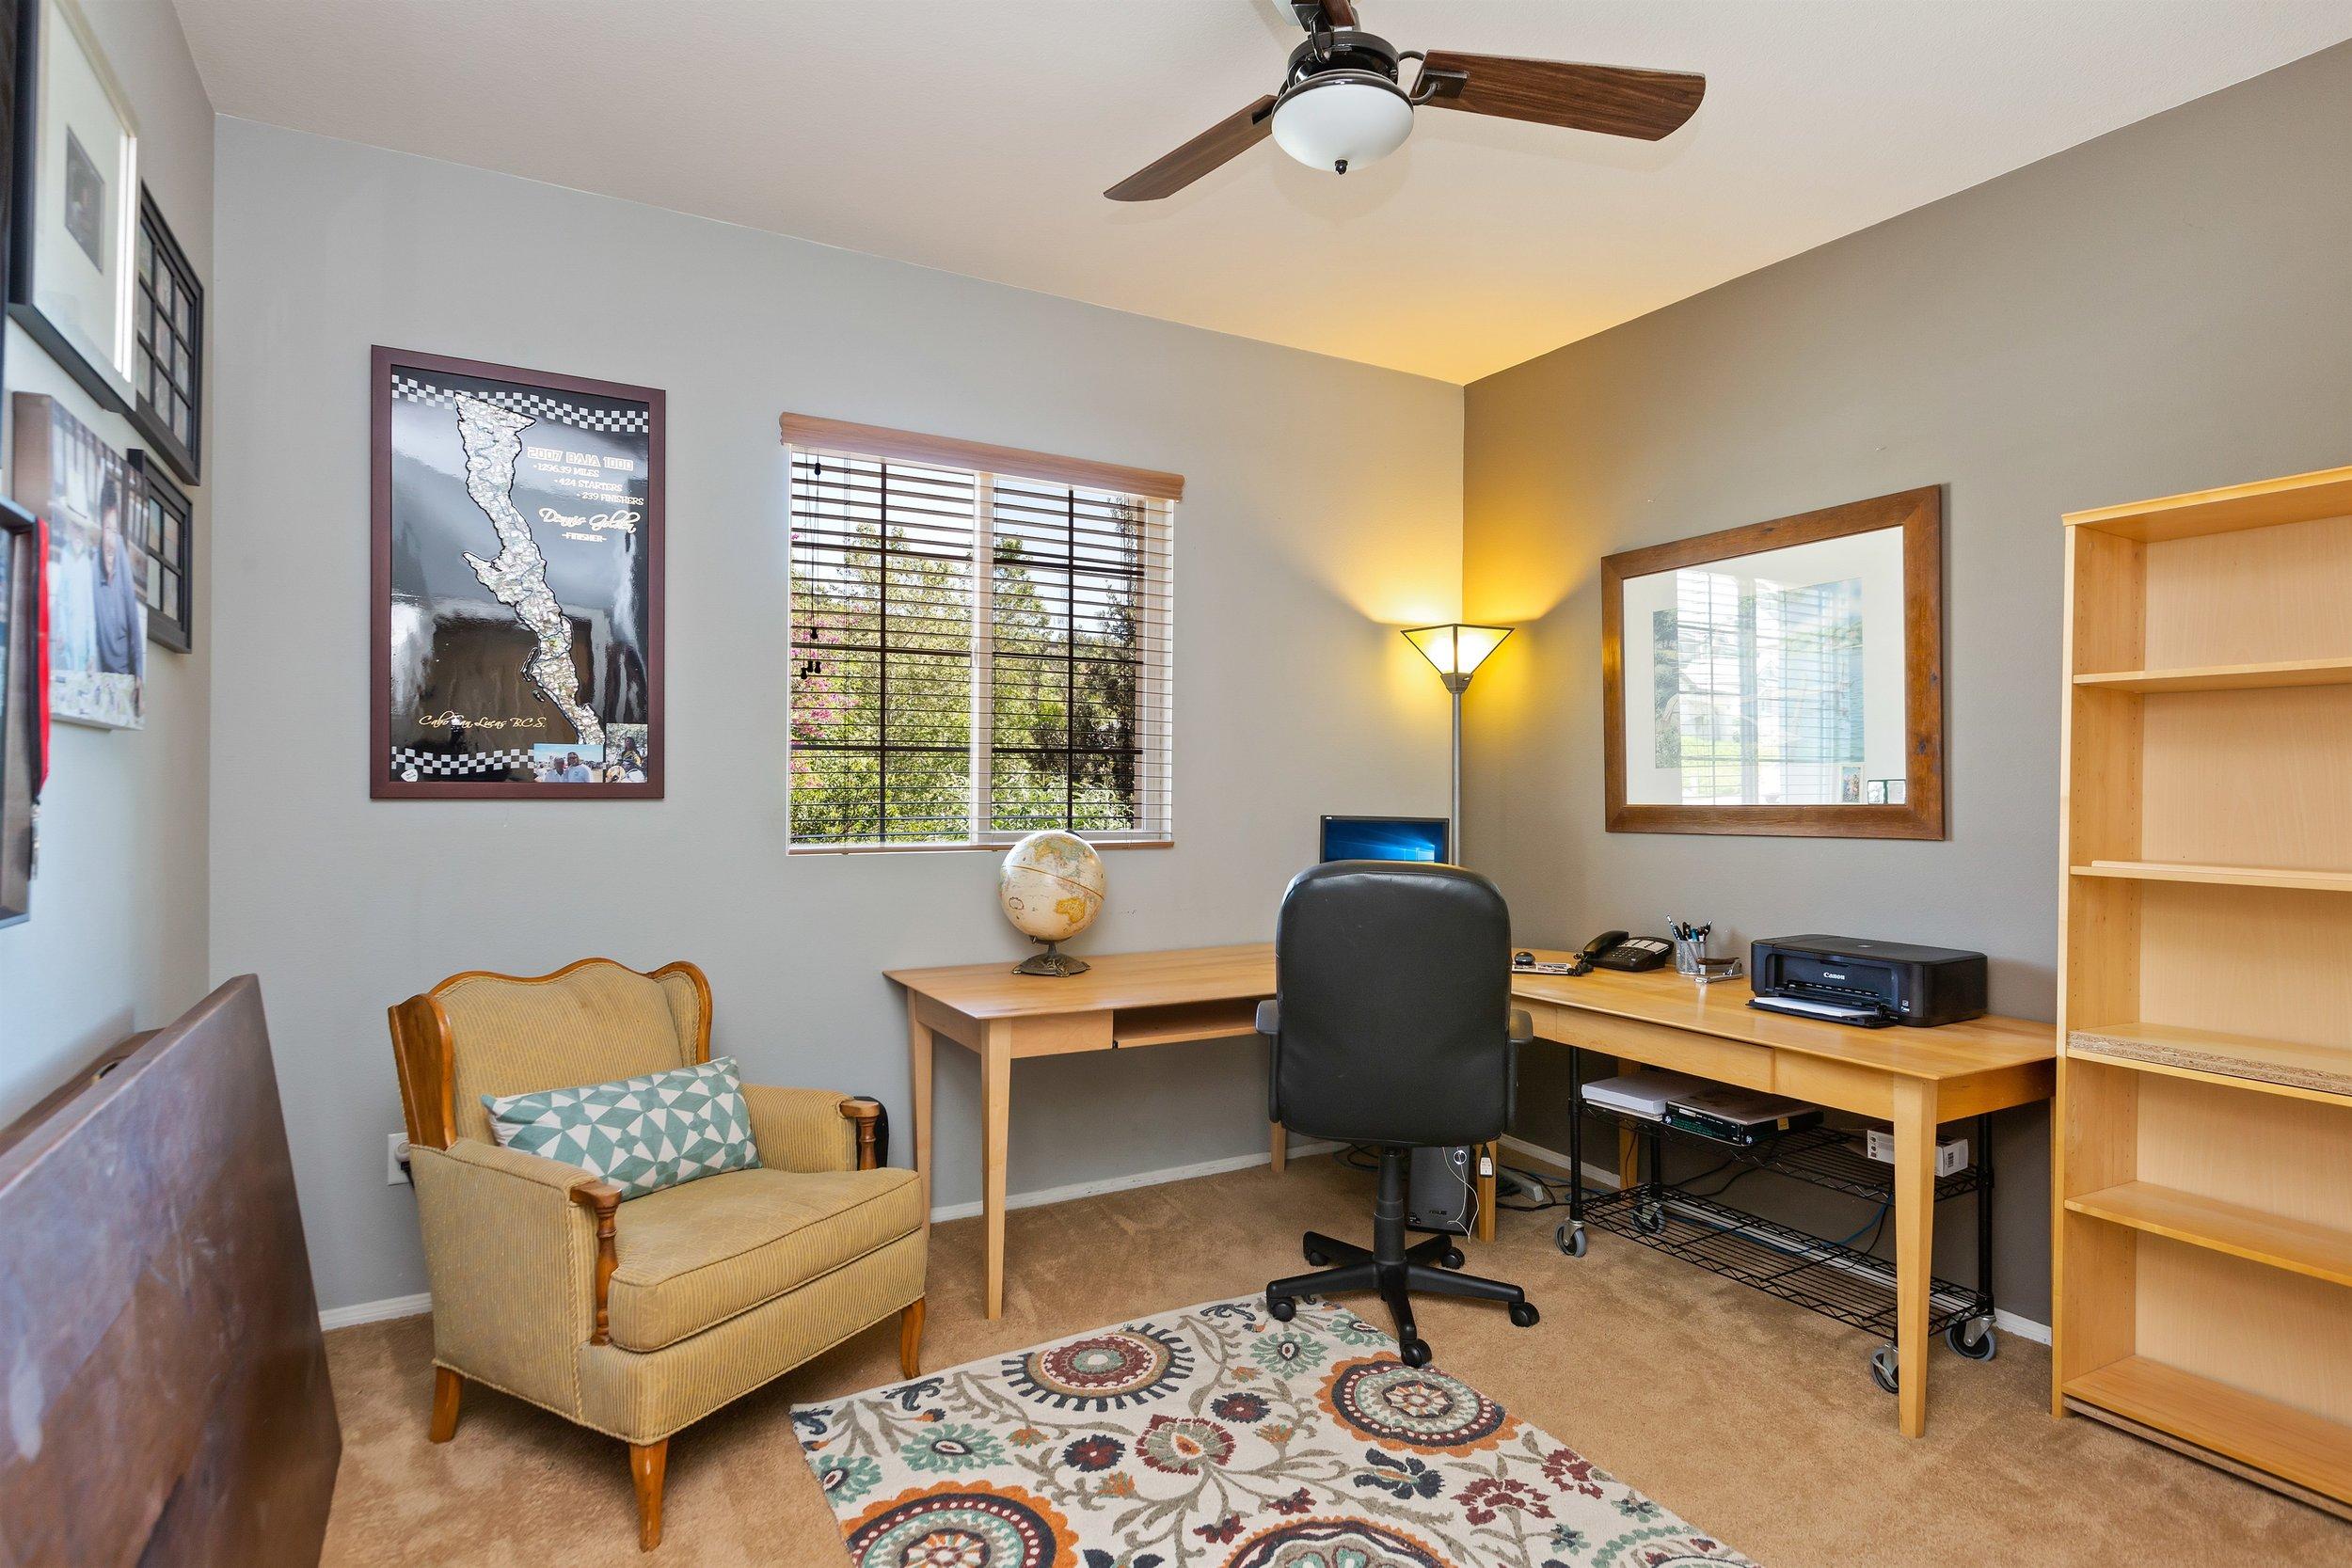 021_OfficeBedroom.jpg